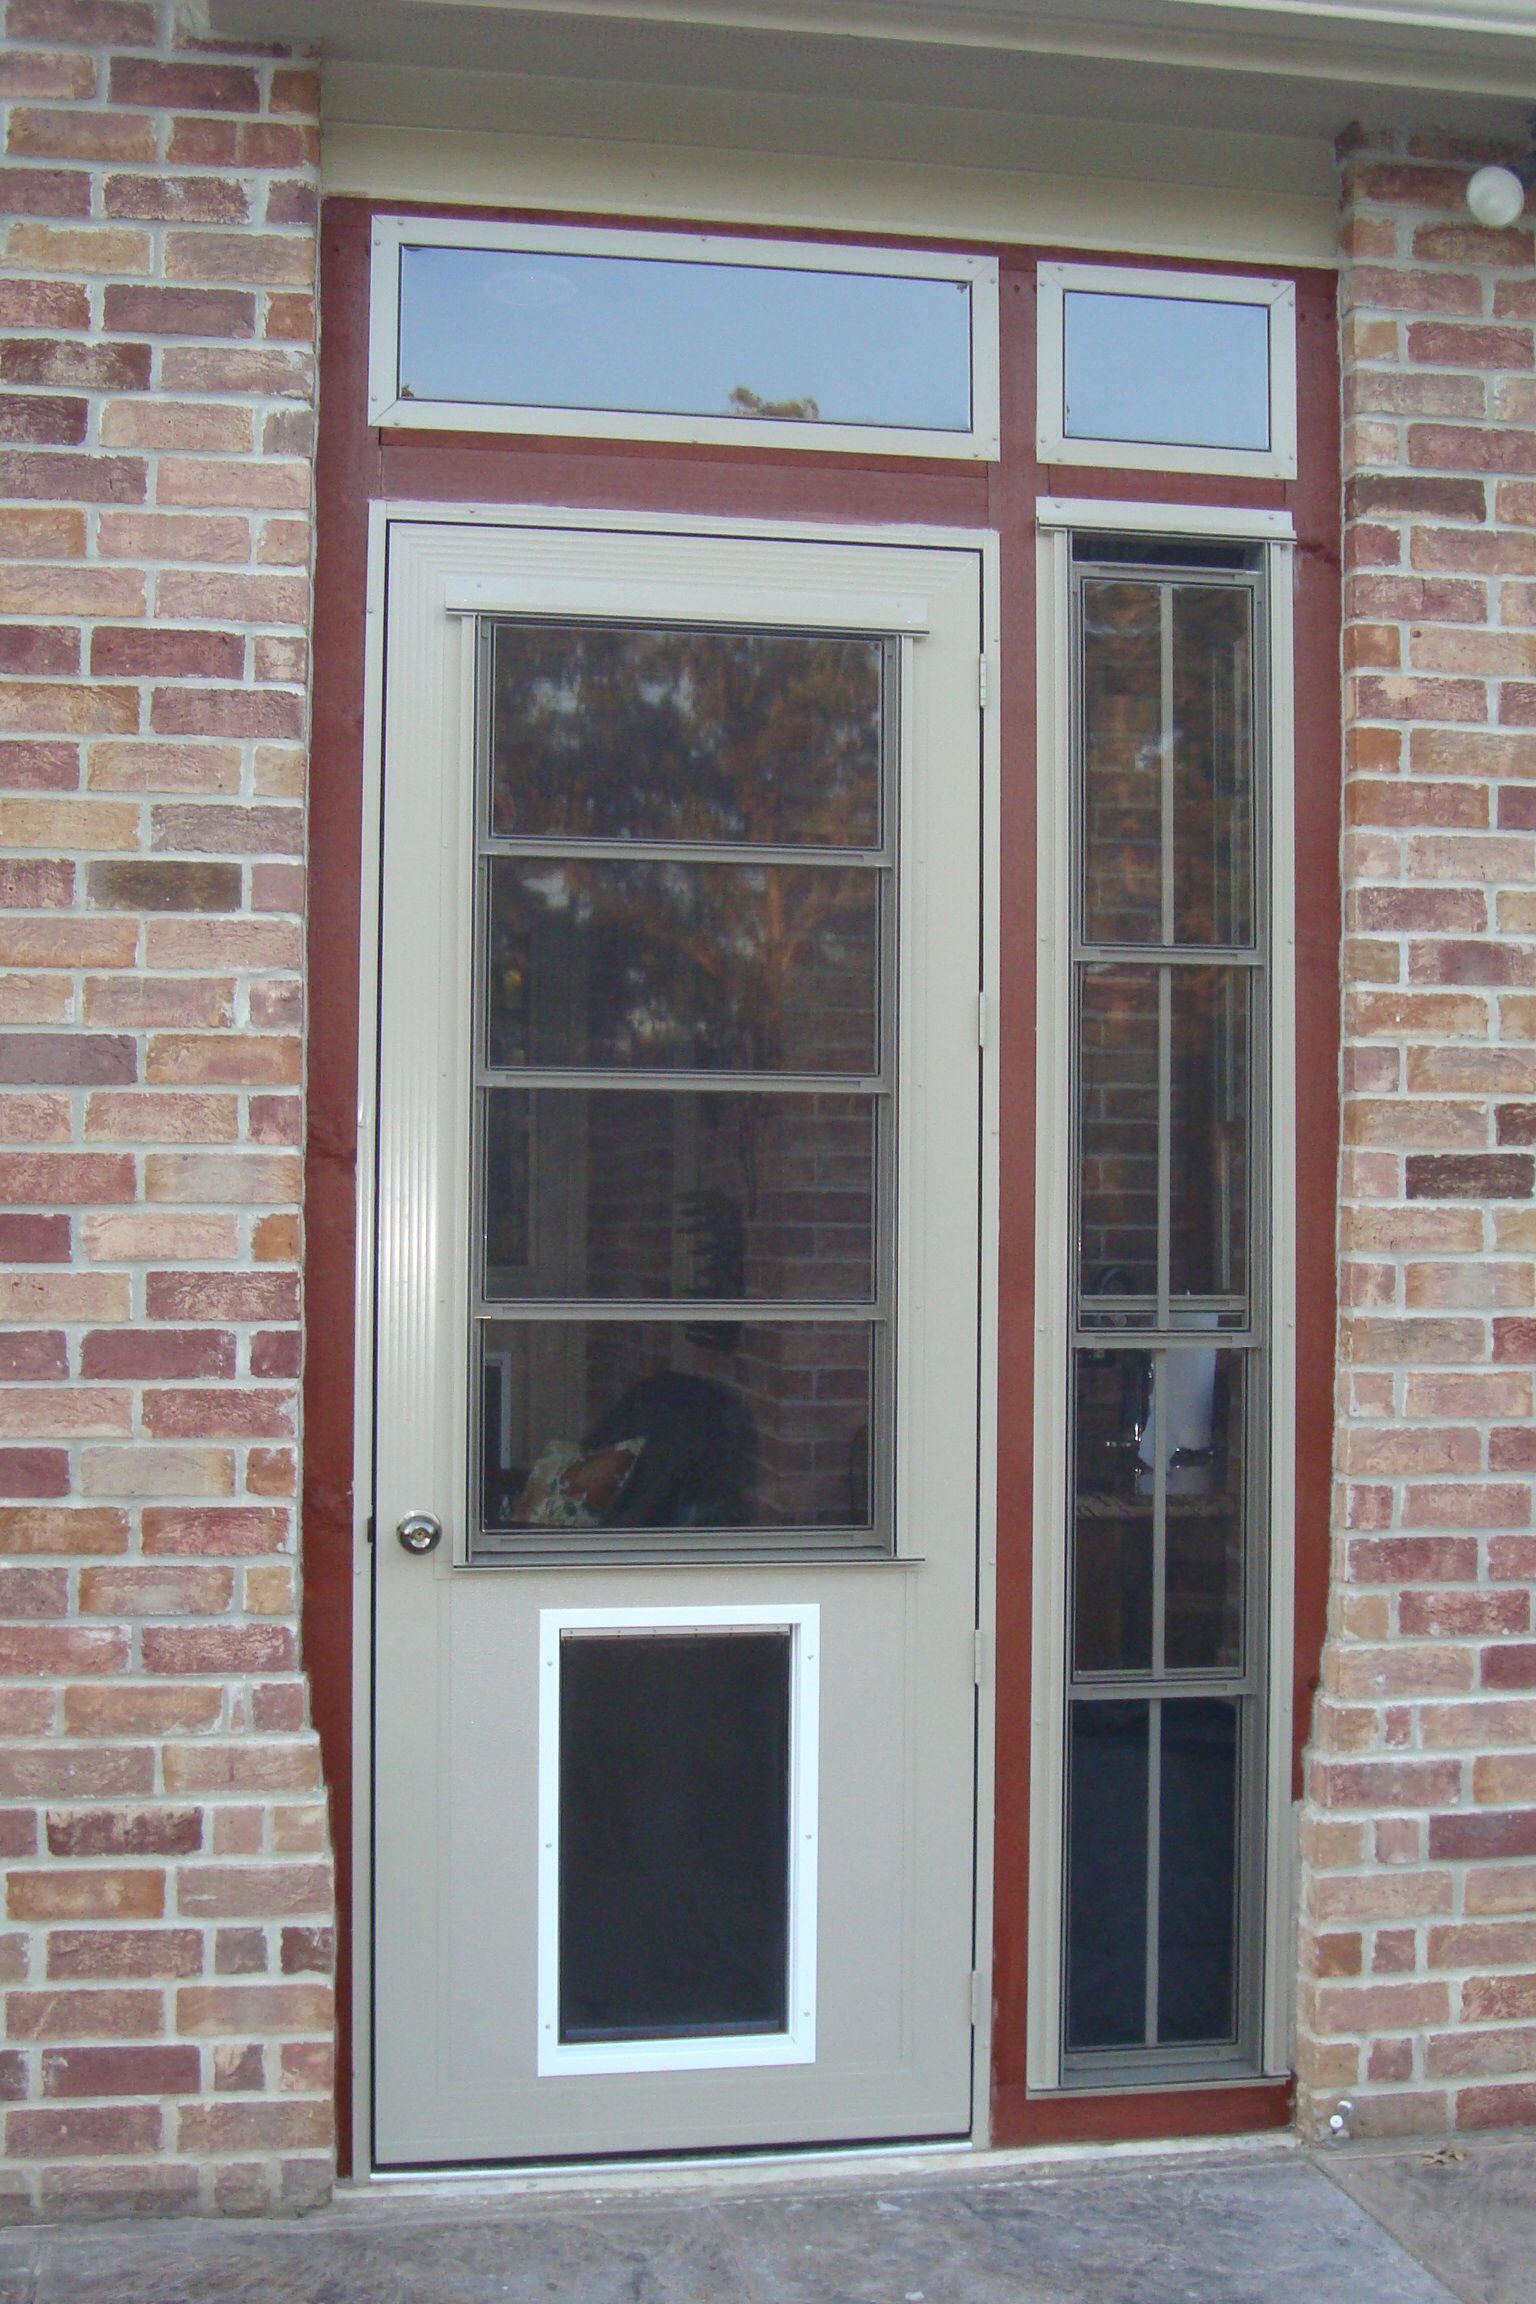 8 Cabana Door With Kick Plate For Large Pet Door Porch